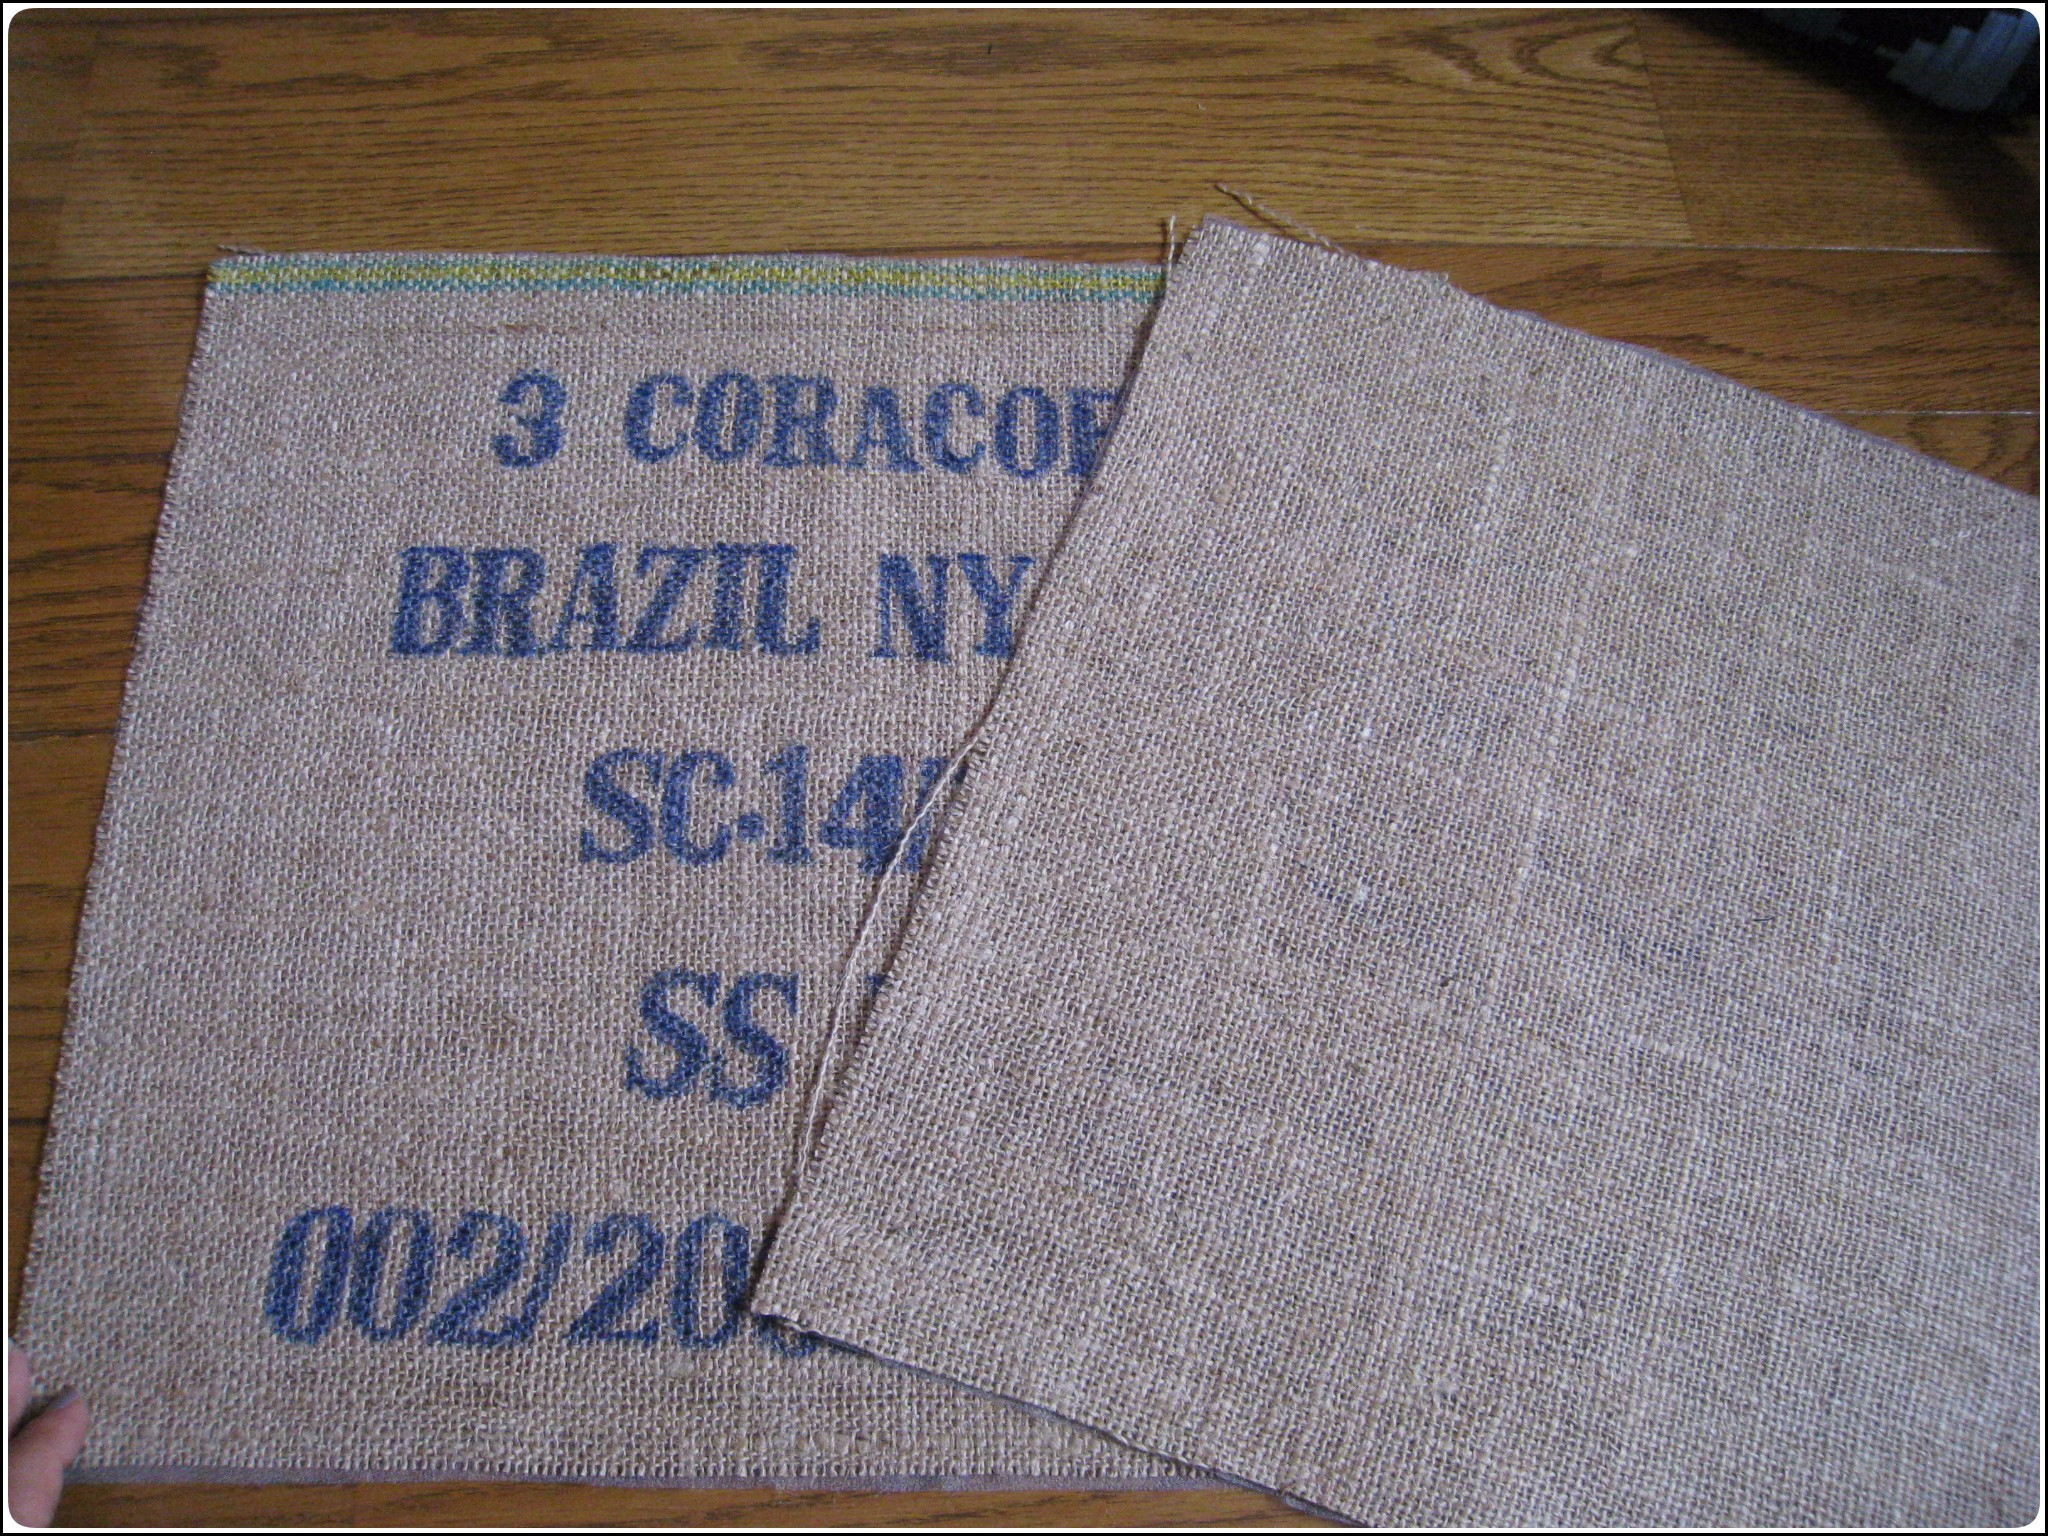 coffeebean_sack_520_3.jpg